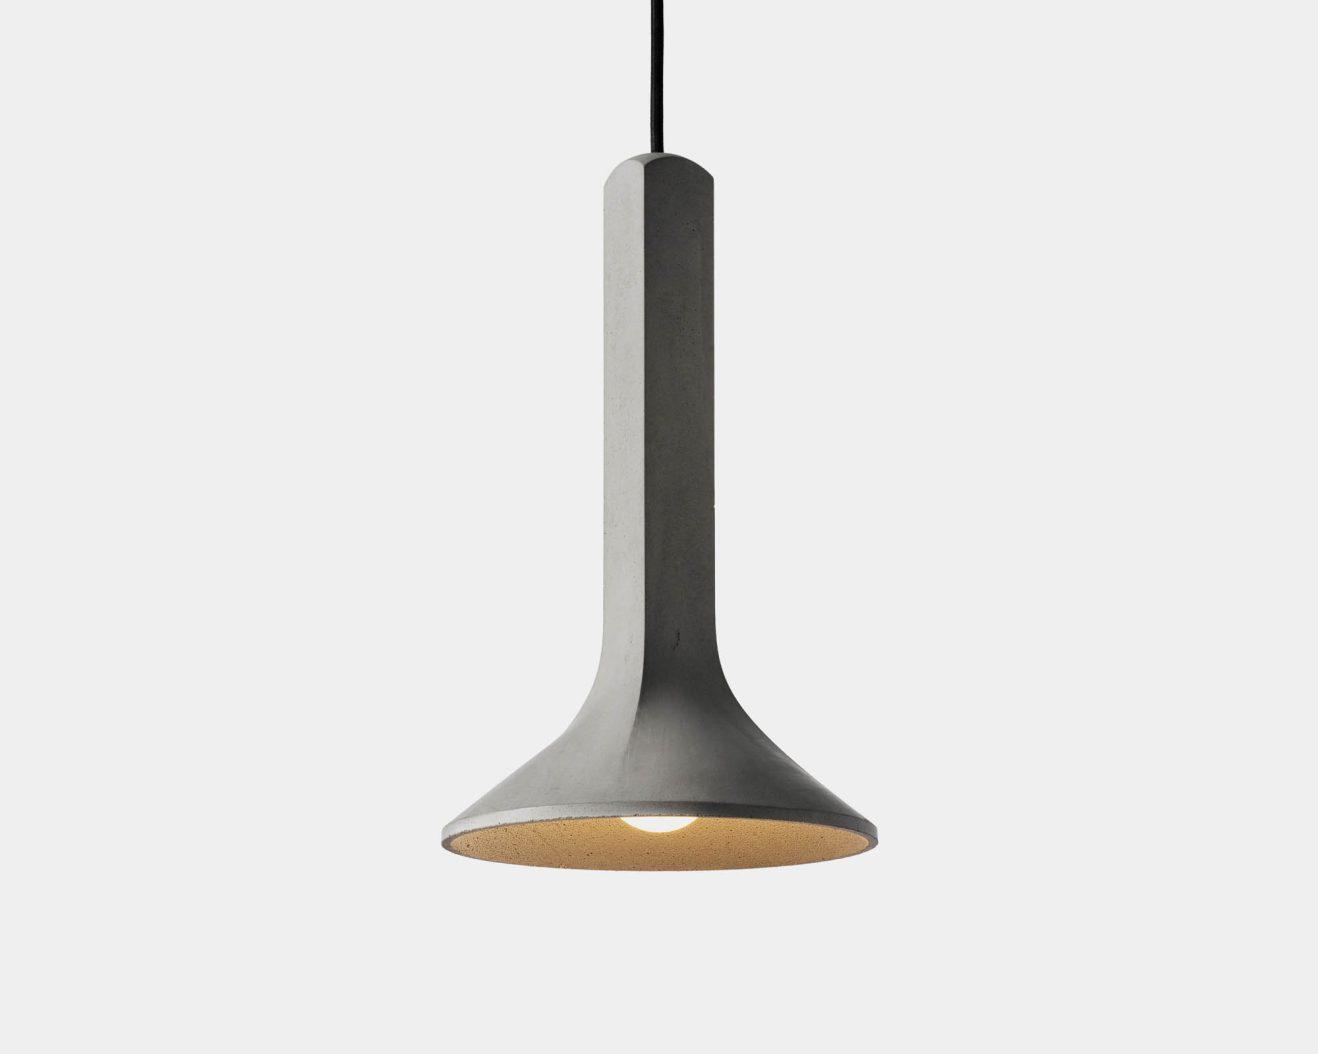 Chuan-BentuDesign-pendantlamp2